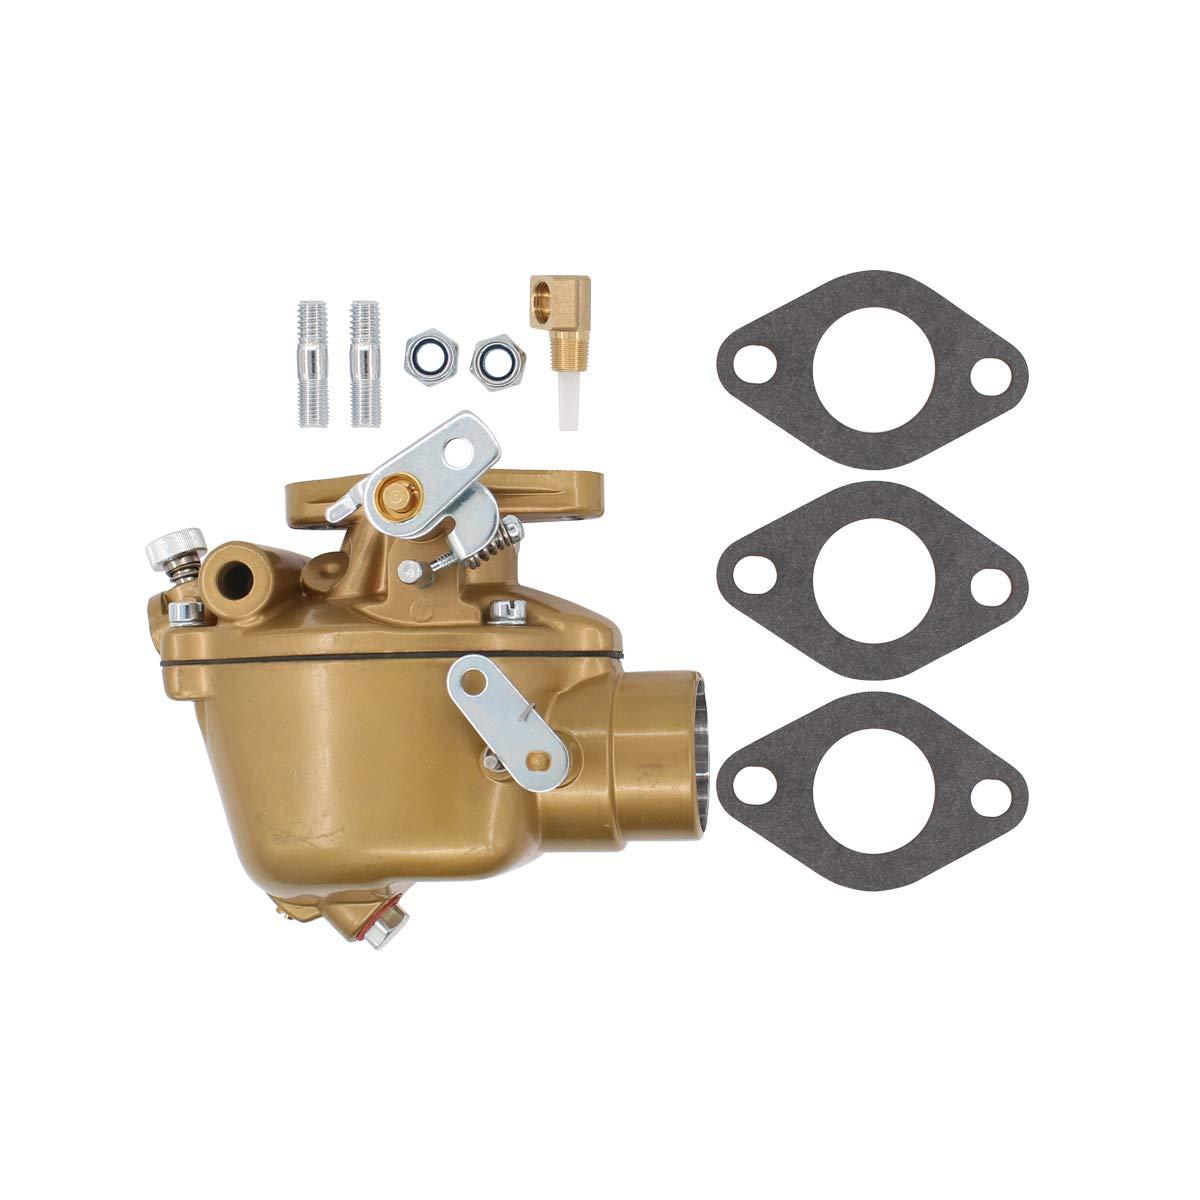 ApplianPar Carburetor Carb for Massey Ferguson TO35 35 40 50 F40 135 150 202 204 Harris Tractor Marvel Schebler TSX605 TSX683 TSX882 533969M91 181532M91 183576M91 194065M91